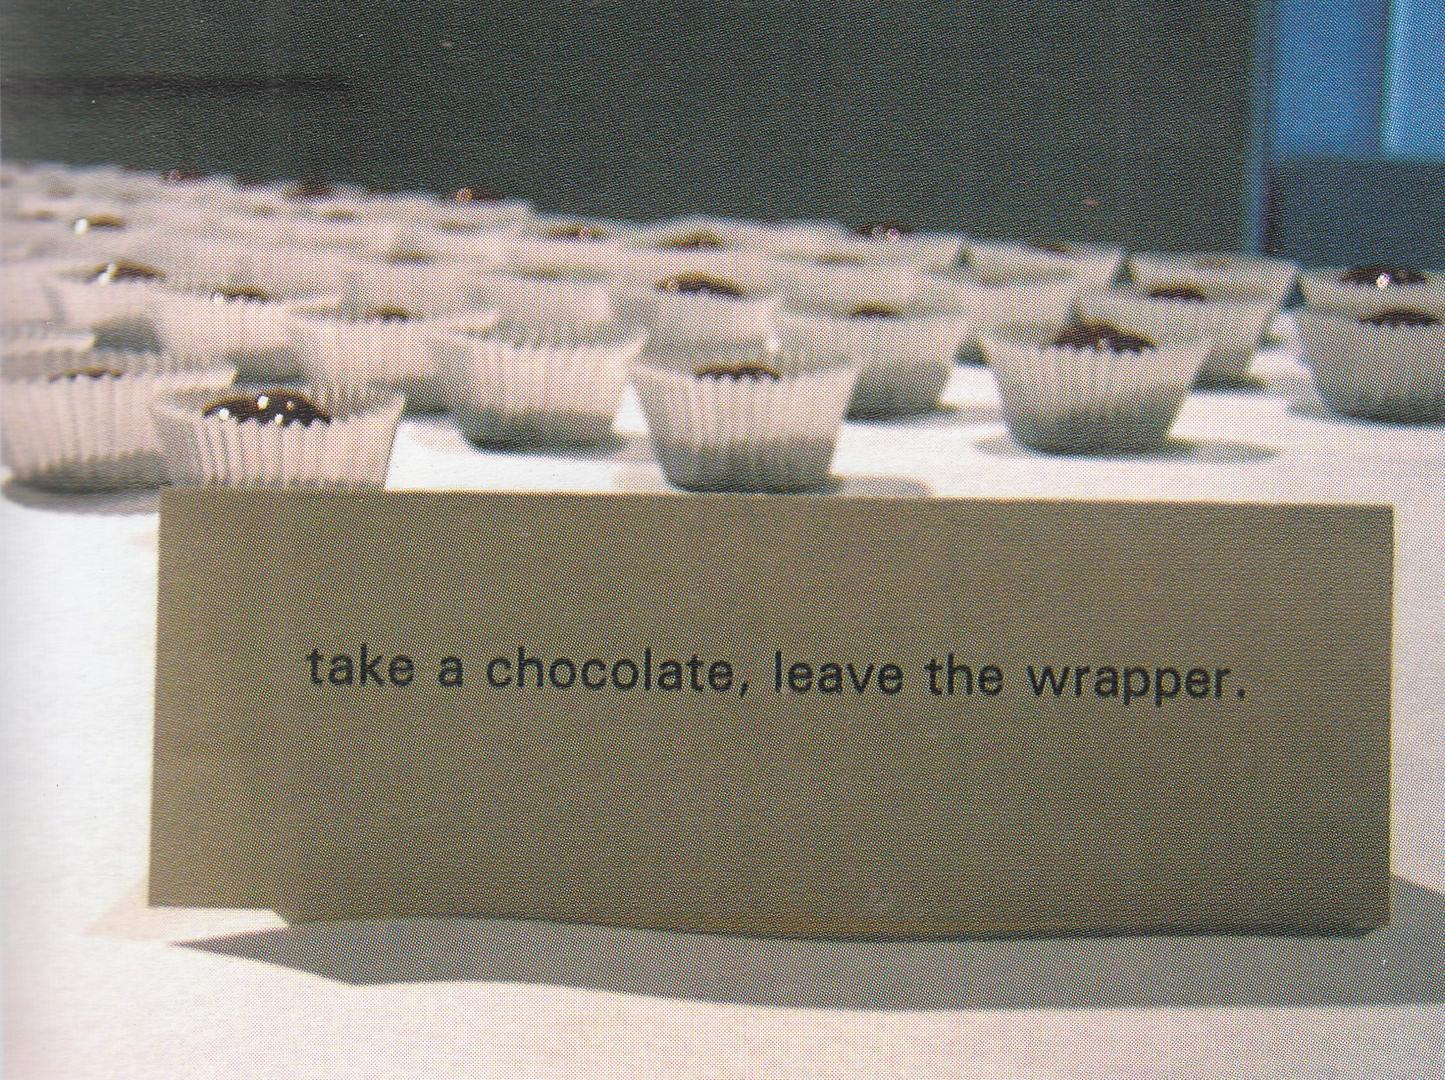 ©, Rachel Egenhoefer, Eatable Codes